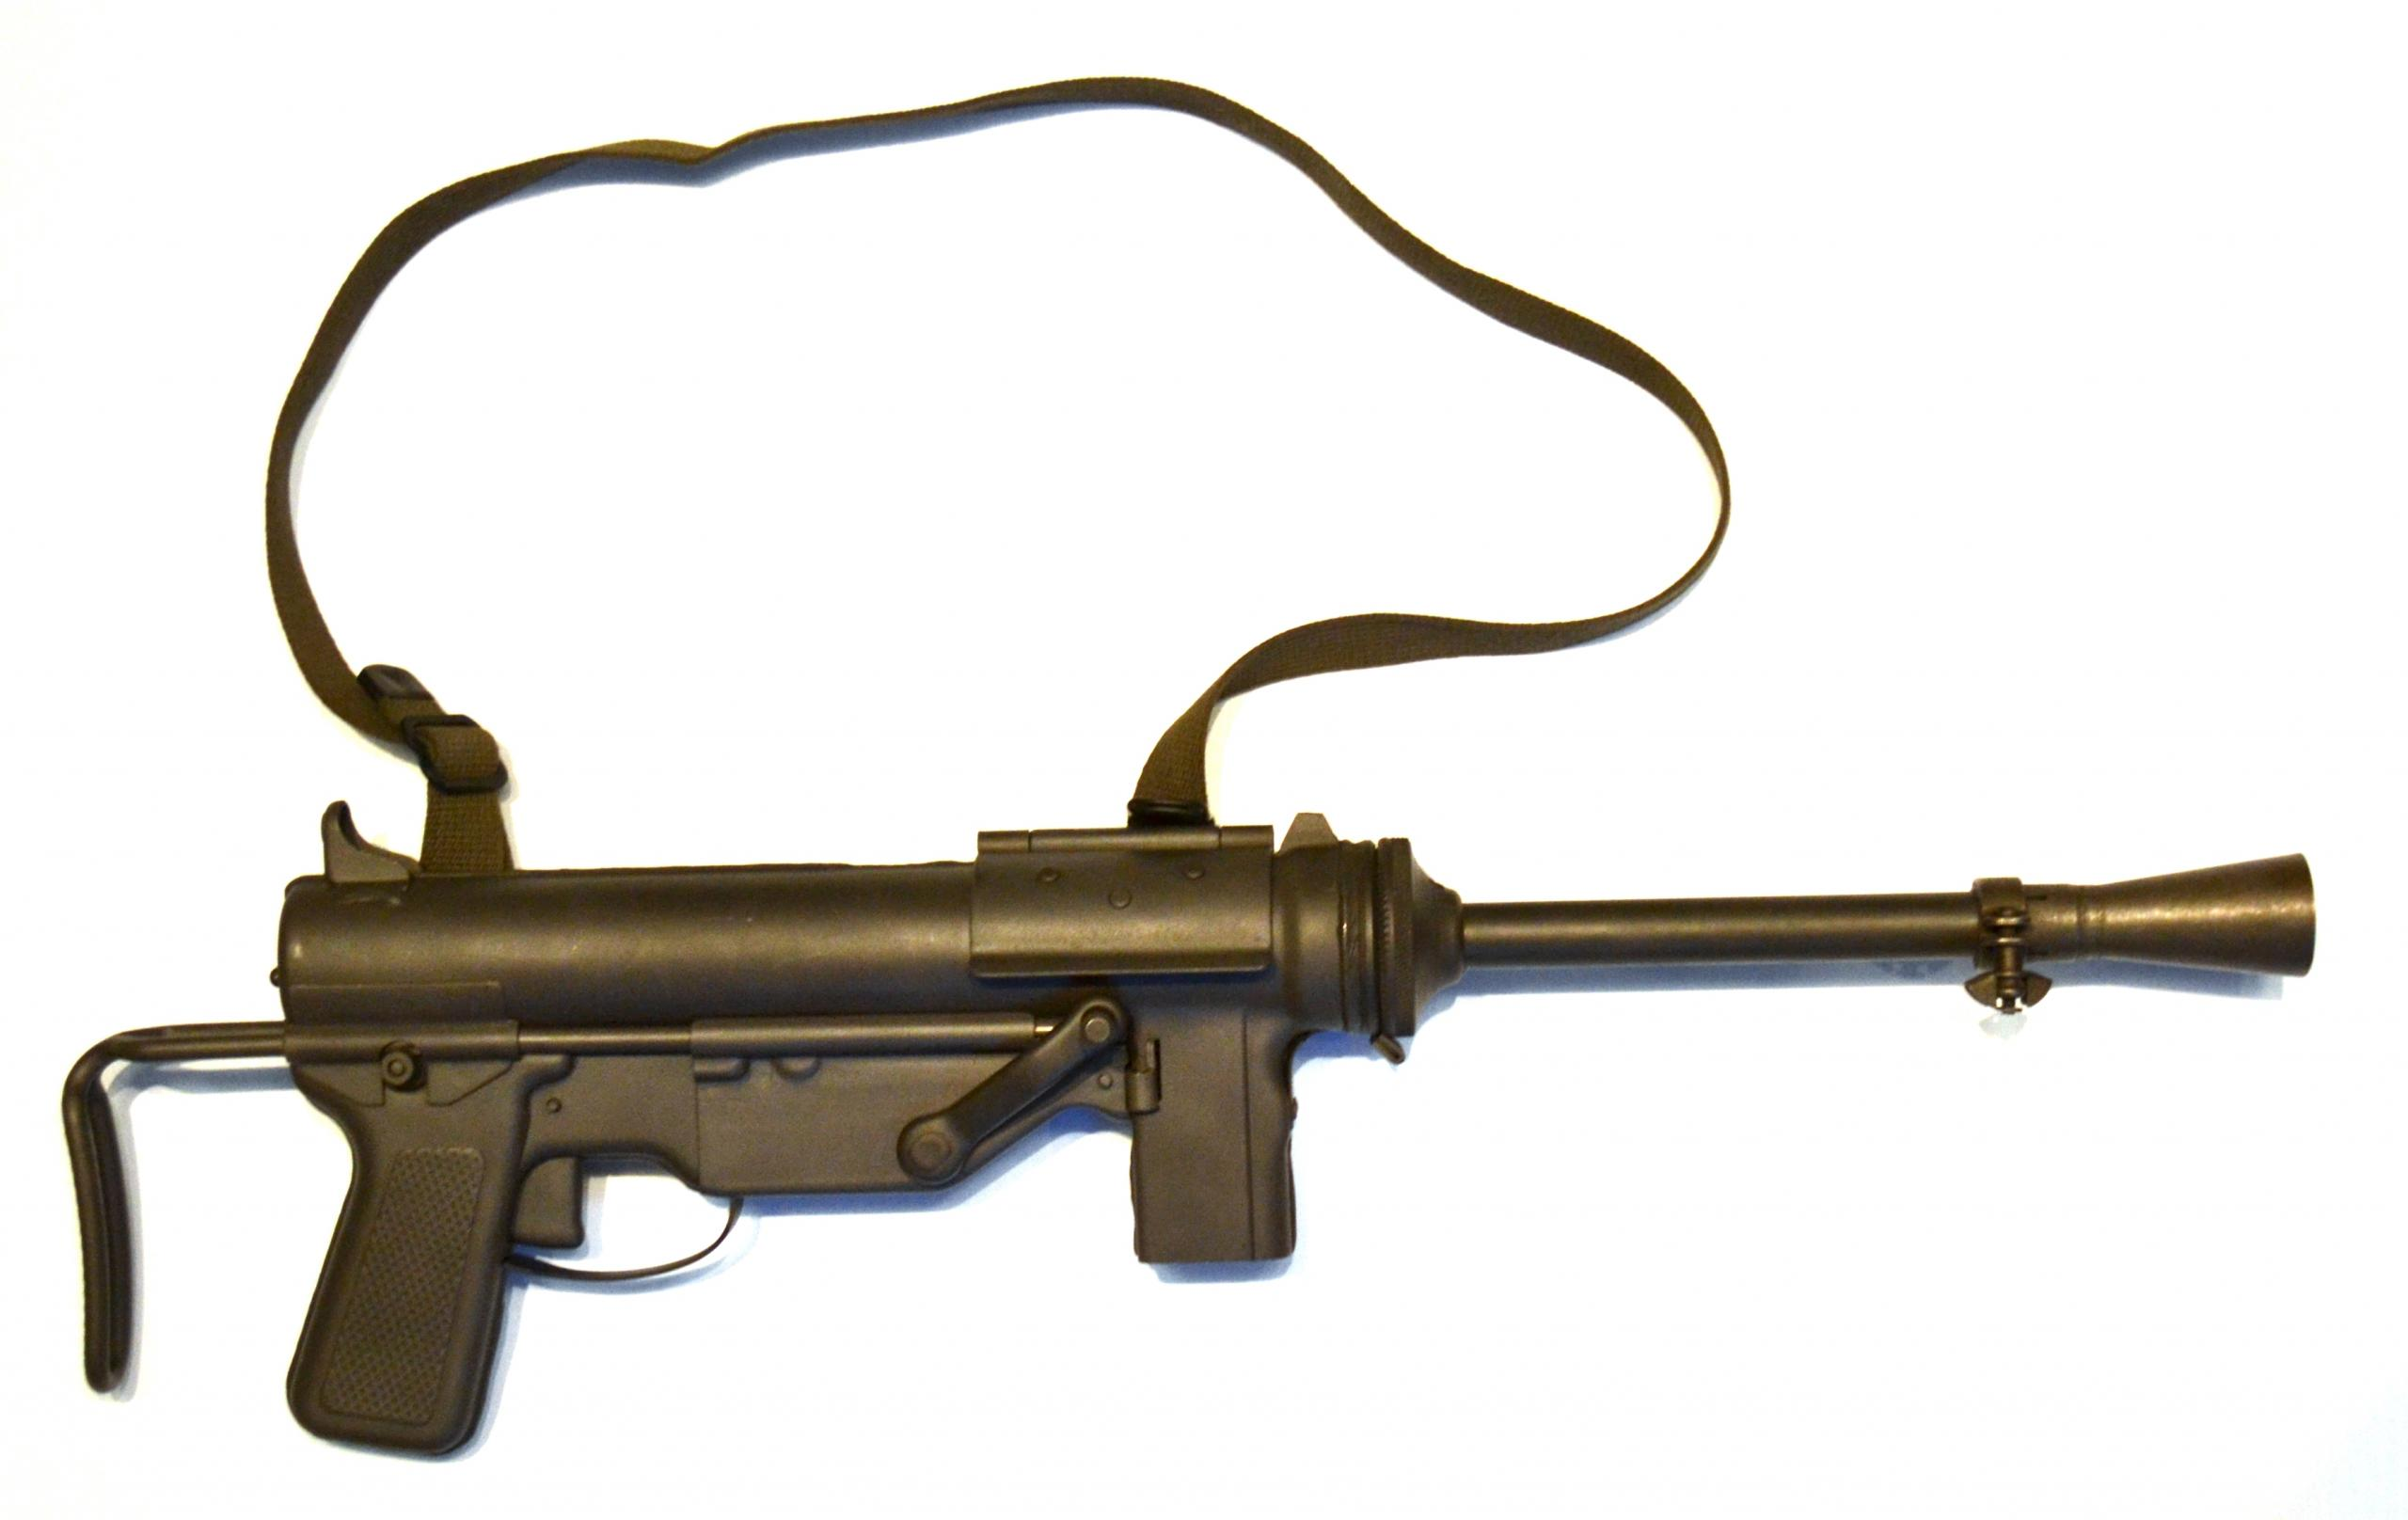 WTS: M3 Grease Gun $5,800 - NFA Market Board - Sturmgewehr com Forums